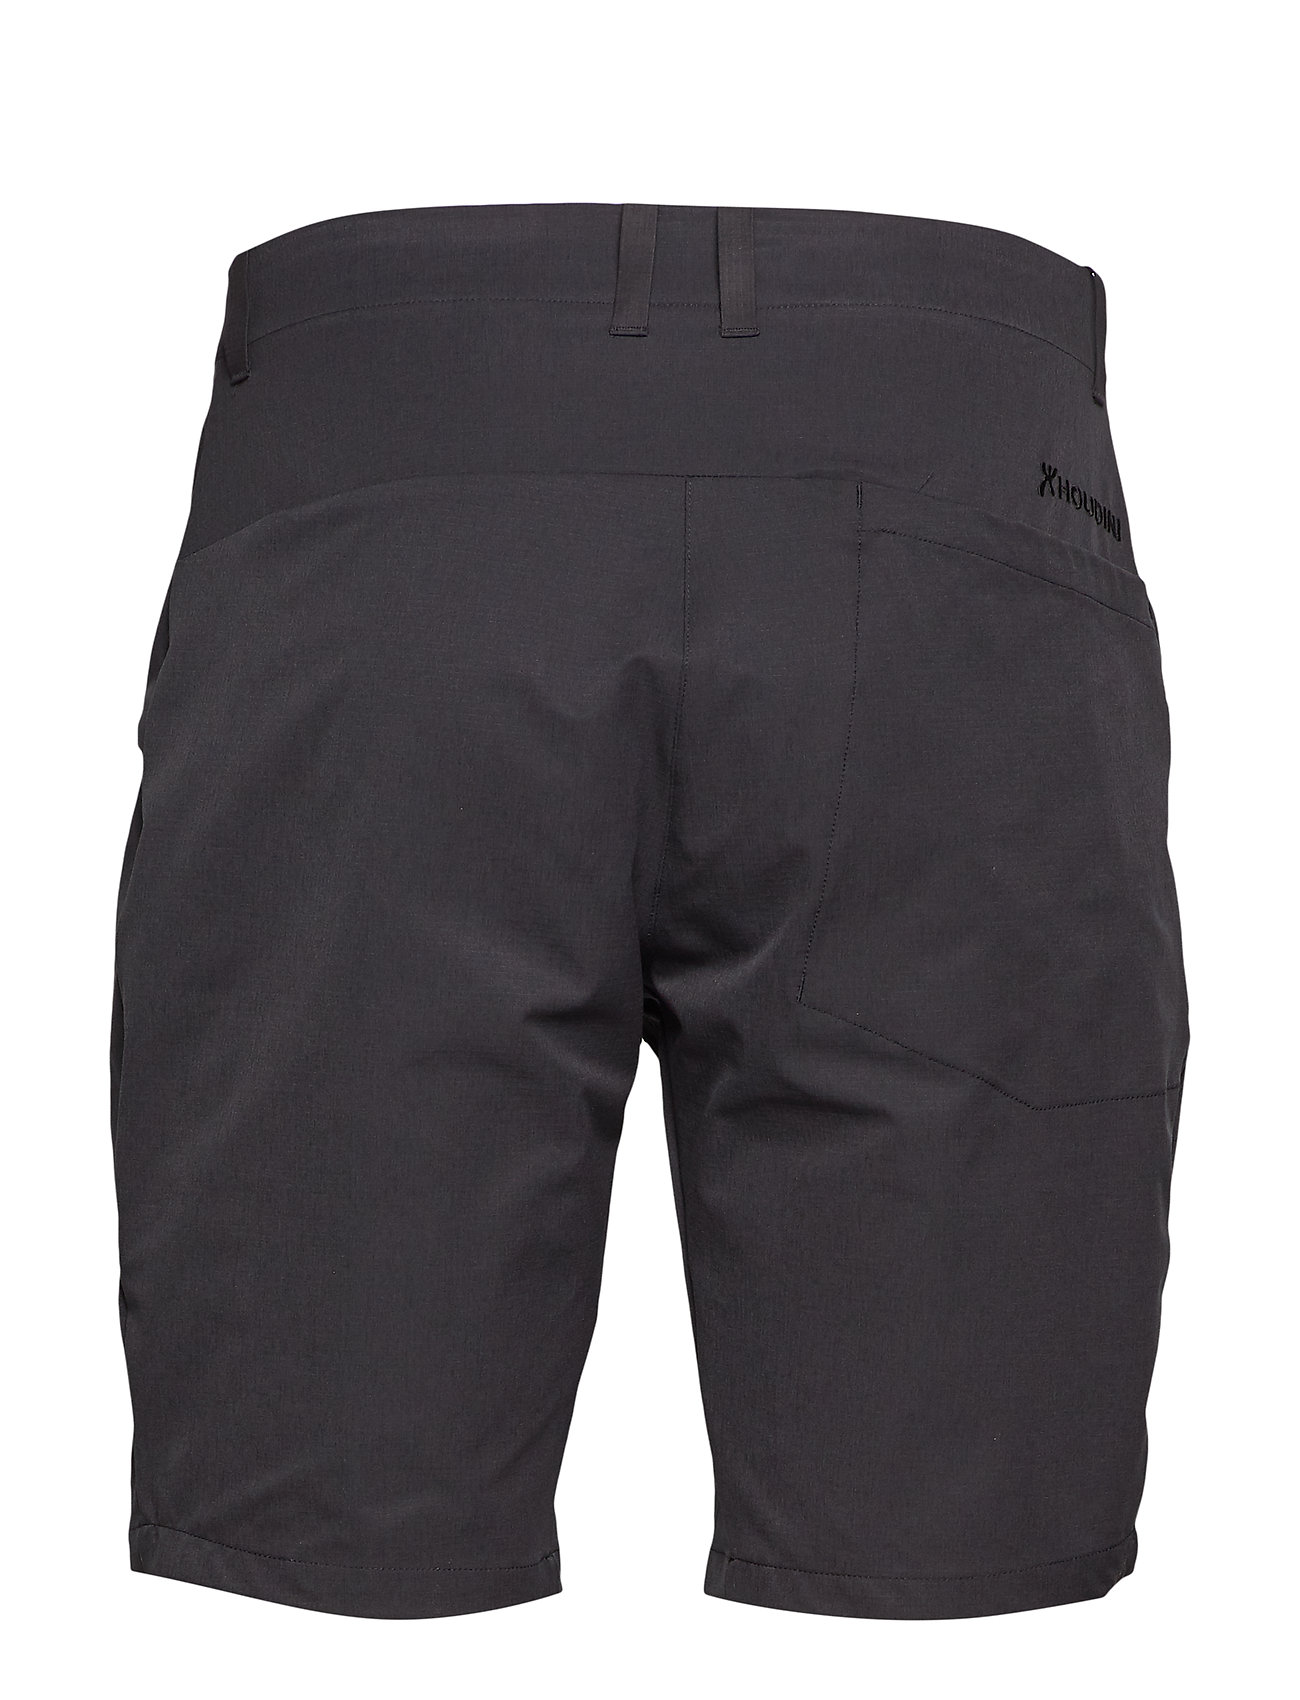 Houdini - M's Daybreak Shorts true black S - casual shorts - true black - 1